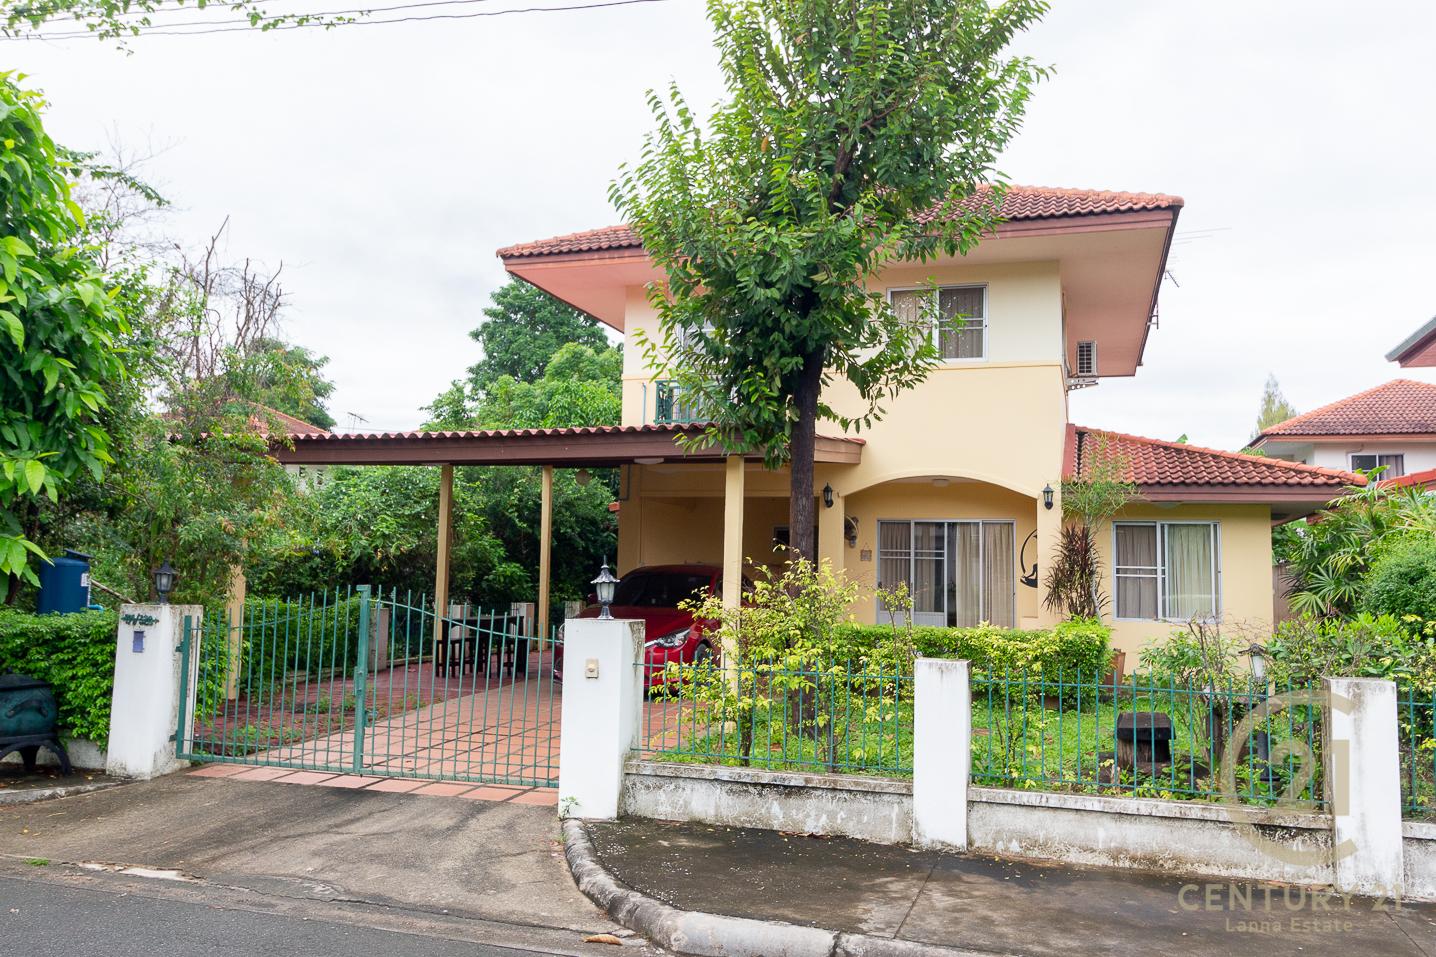 2 Storey House fully furnished for SALE in gated community Baan Naifun 4 San Kamphaeng